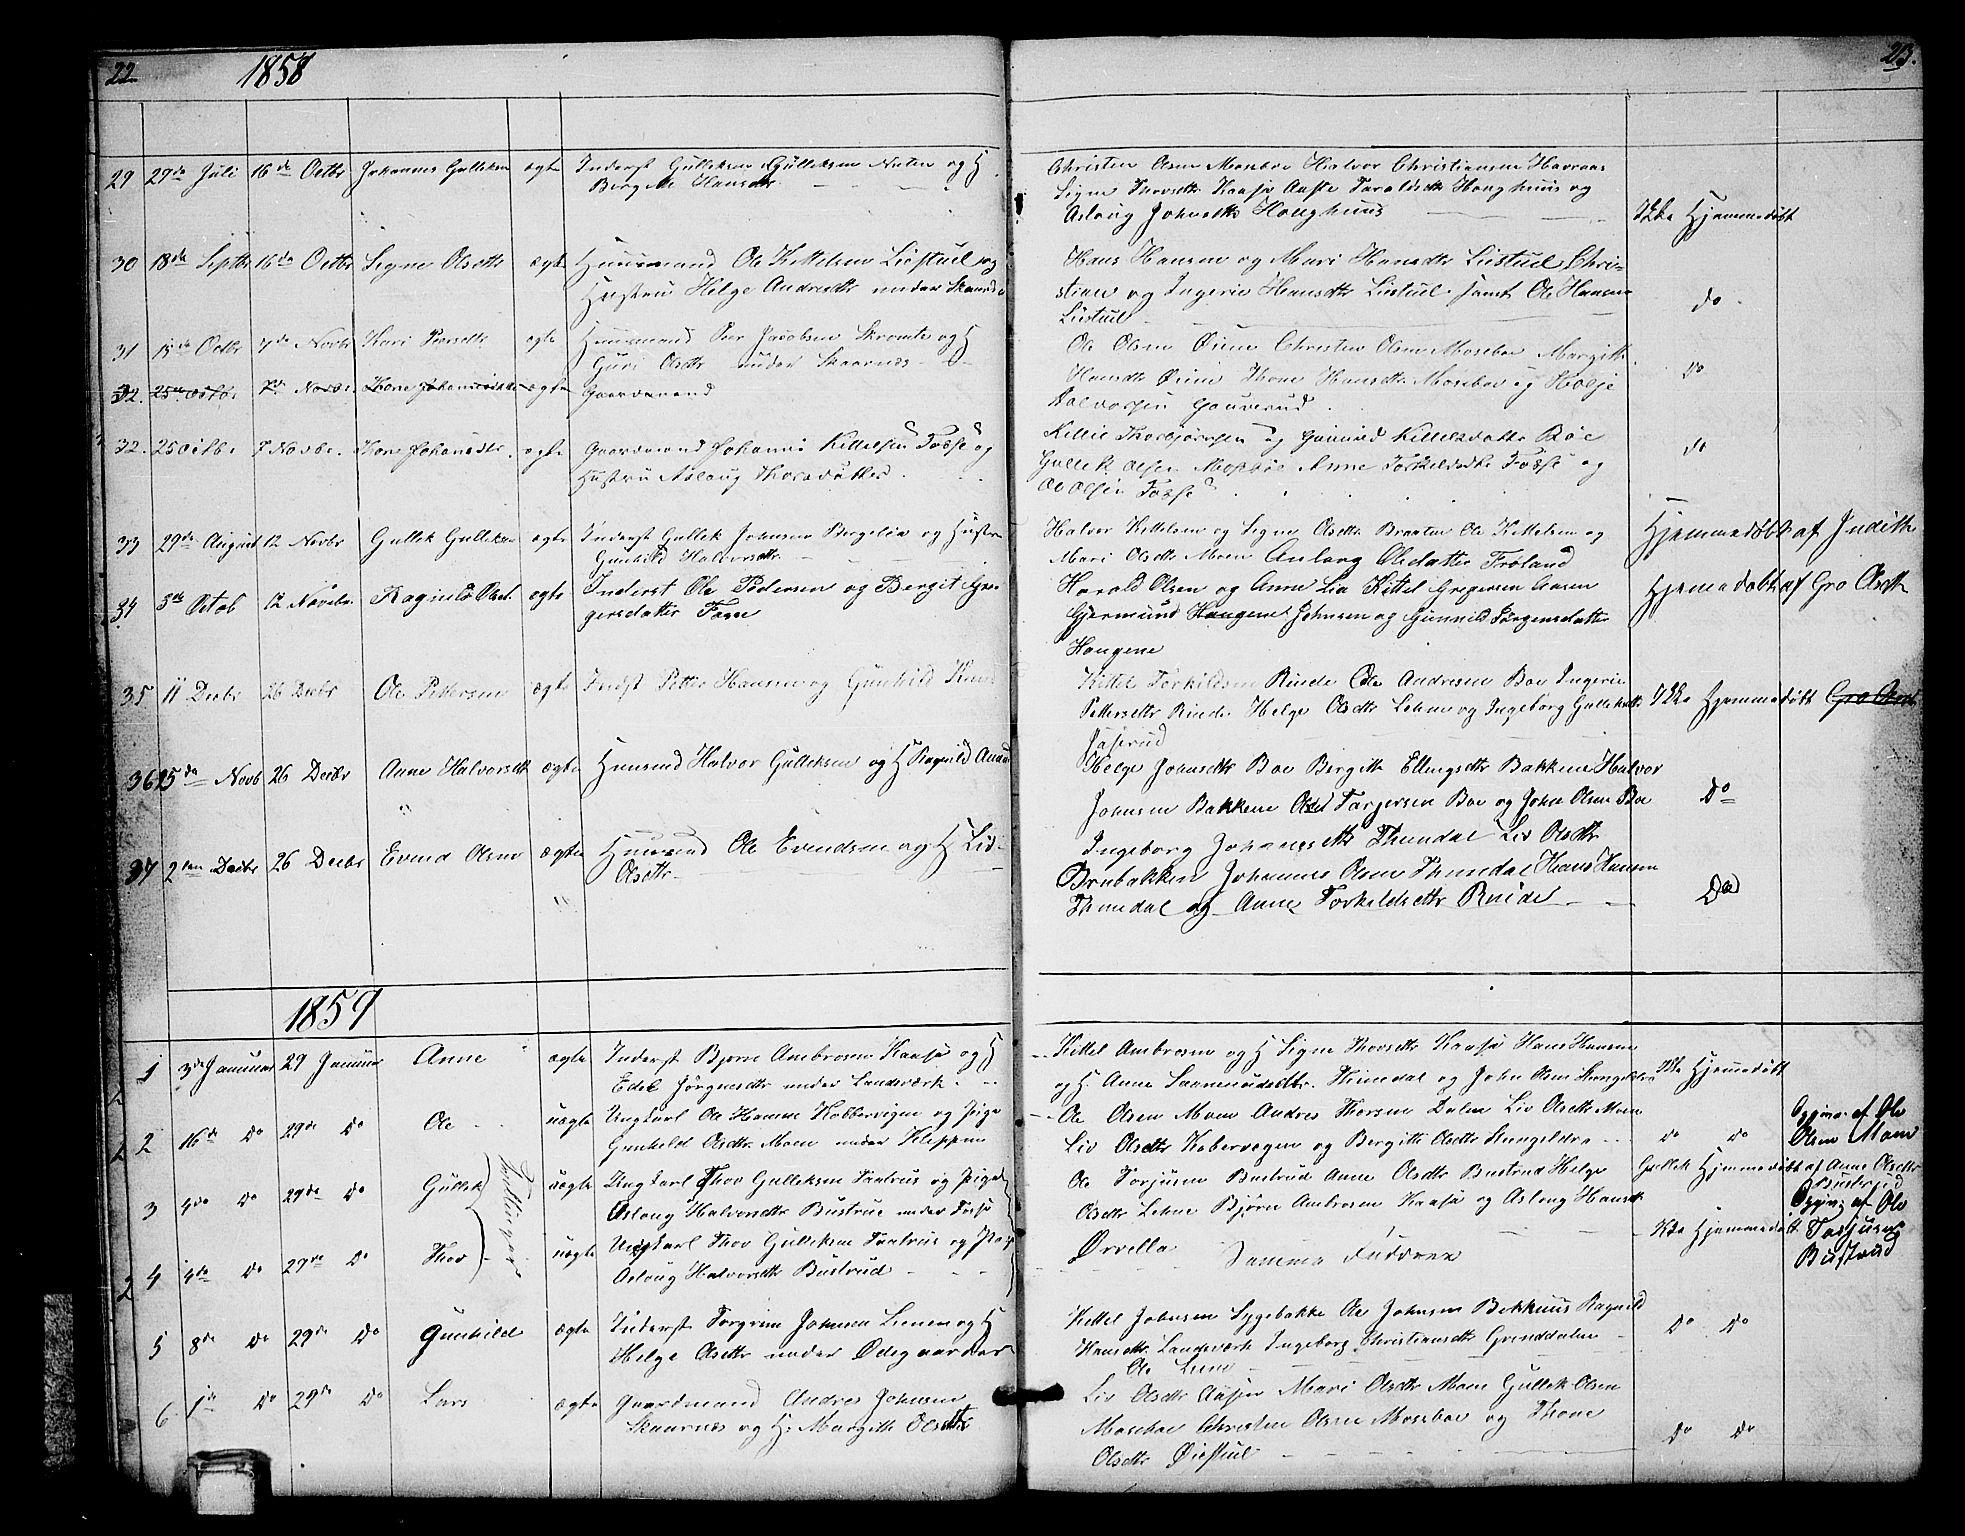 SAKO, Hjartdal kirkebøker, G/Gb/L0002: Klokkerbok nr. II 2, 1854-1884, s. 22-23